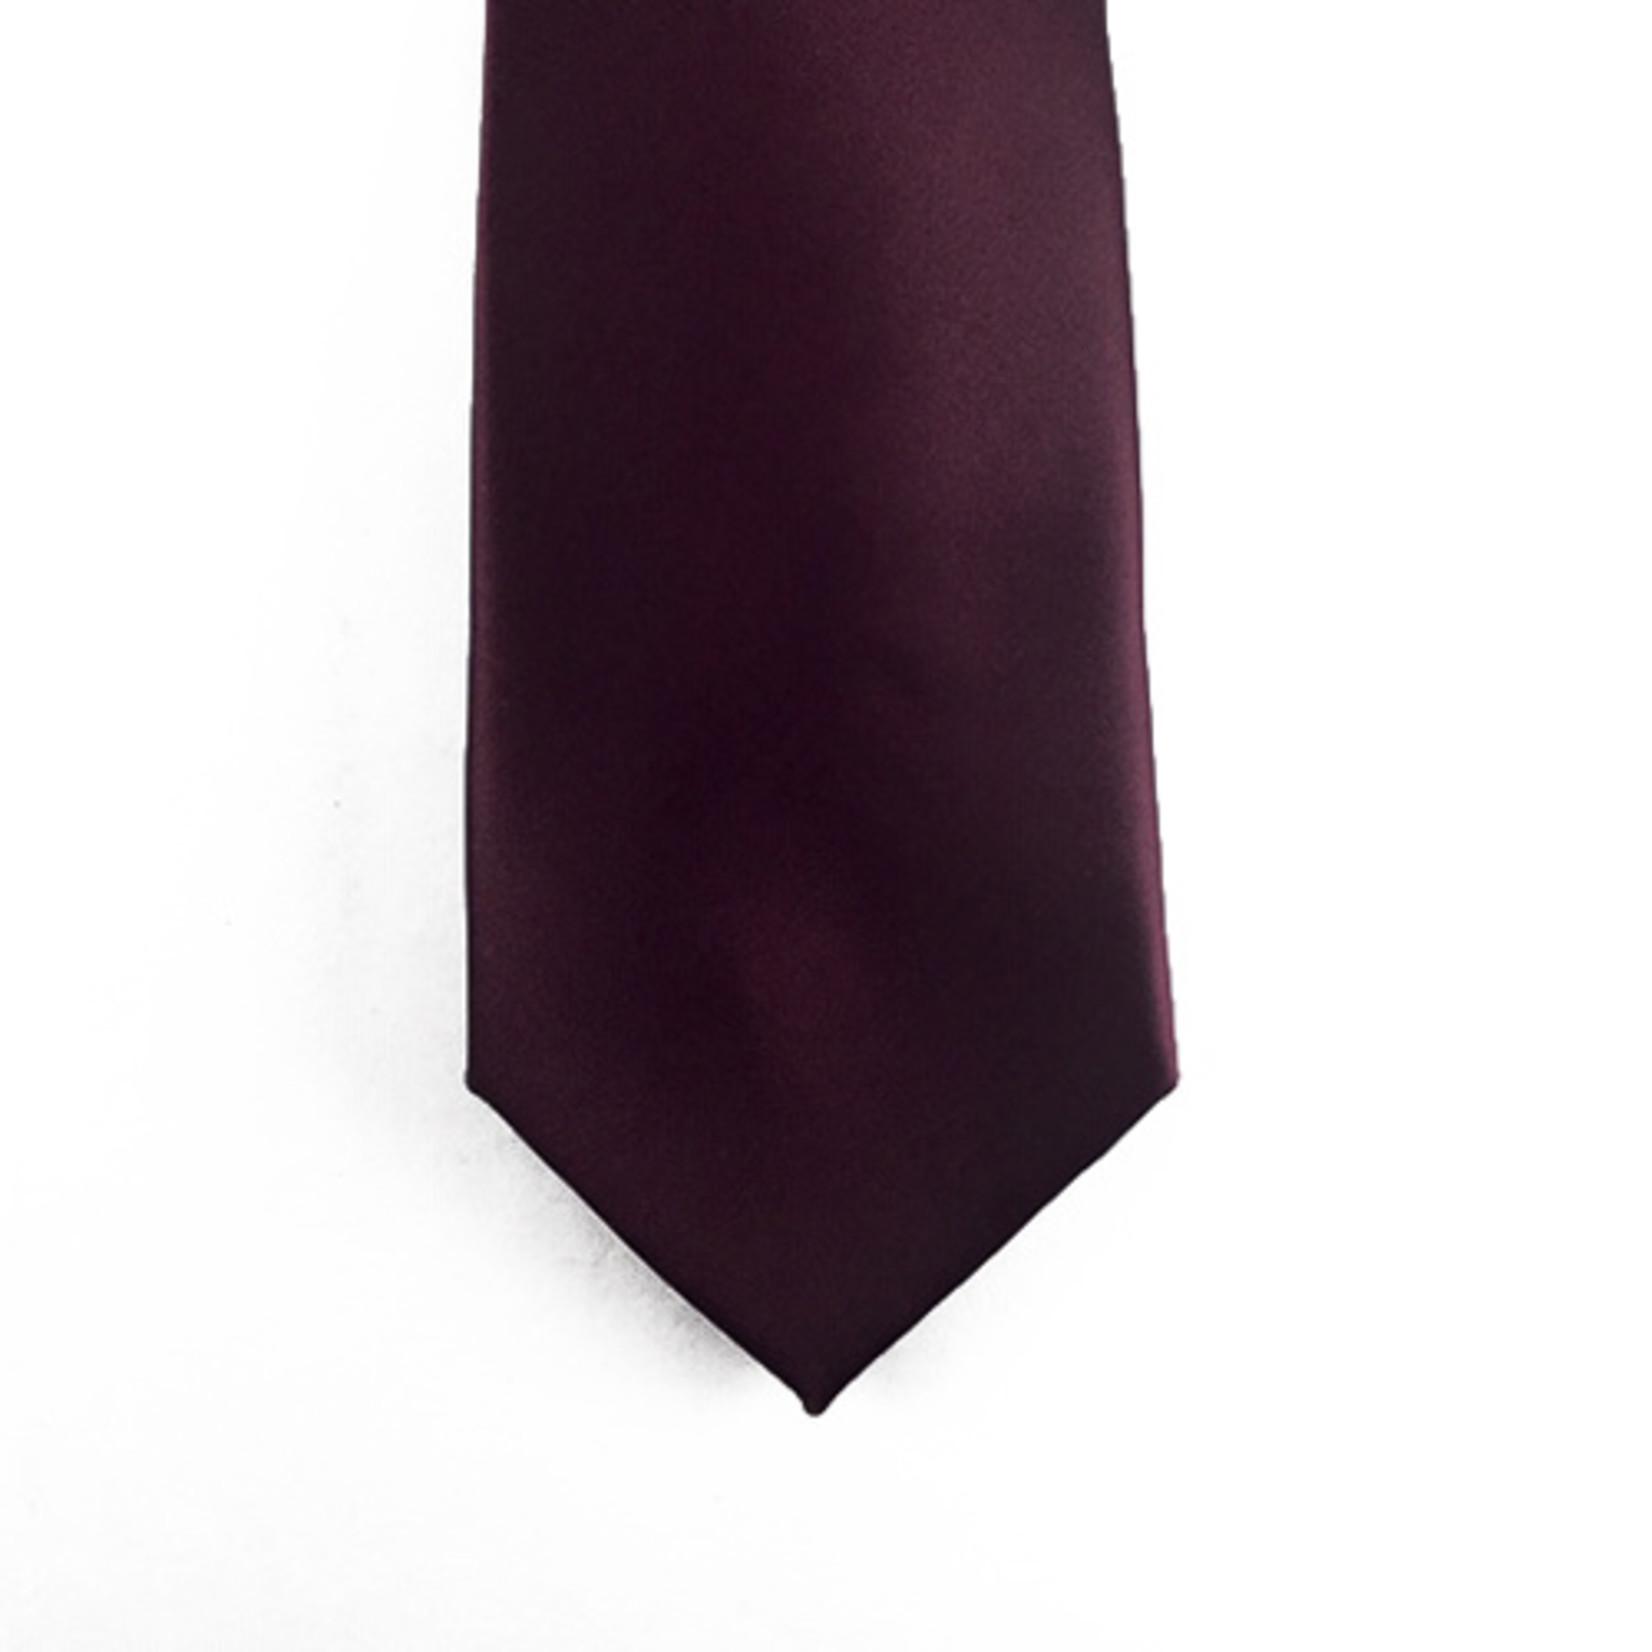 Knotz M100-3 Solid Wine Tie